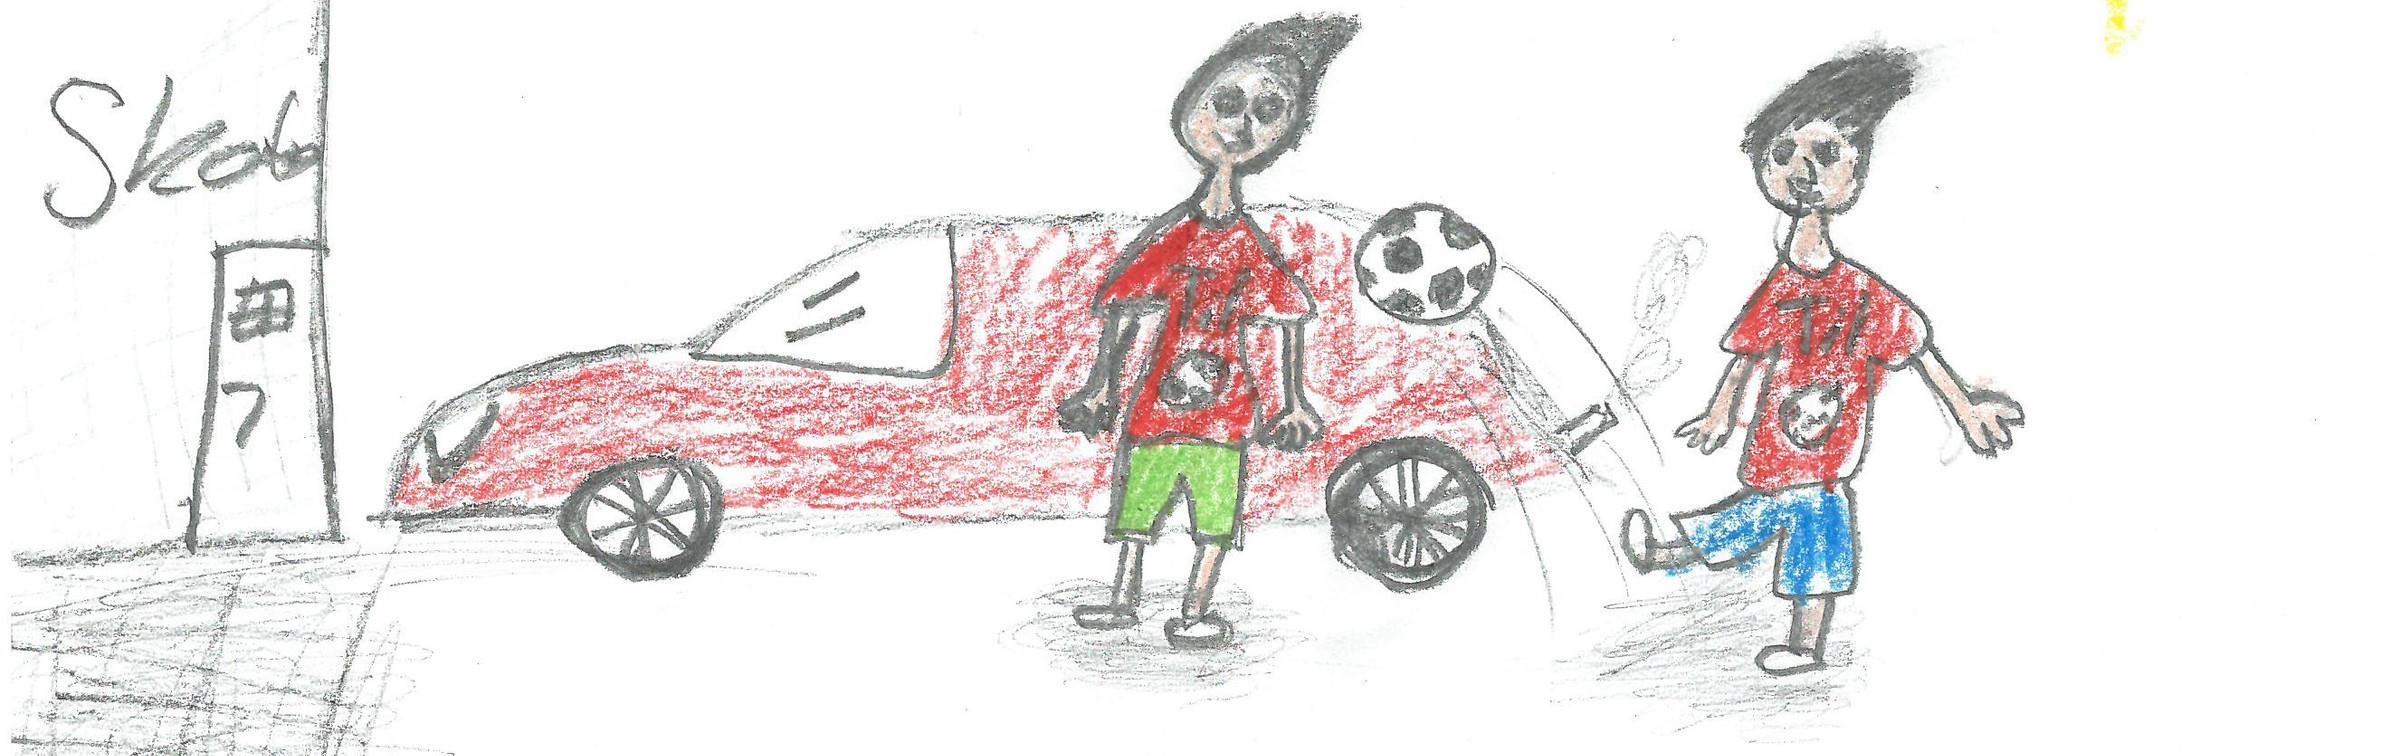 Tegning - fotball på skolen